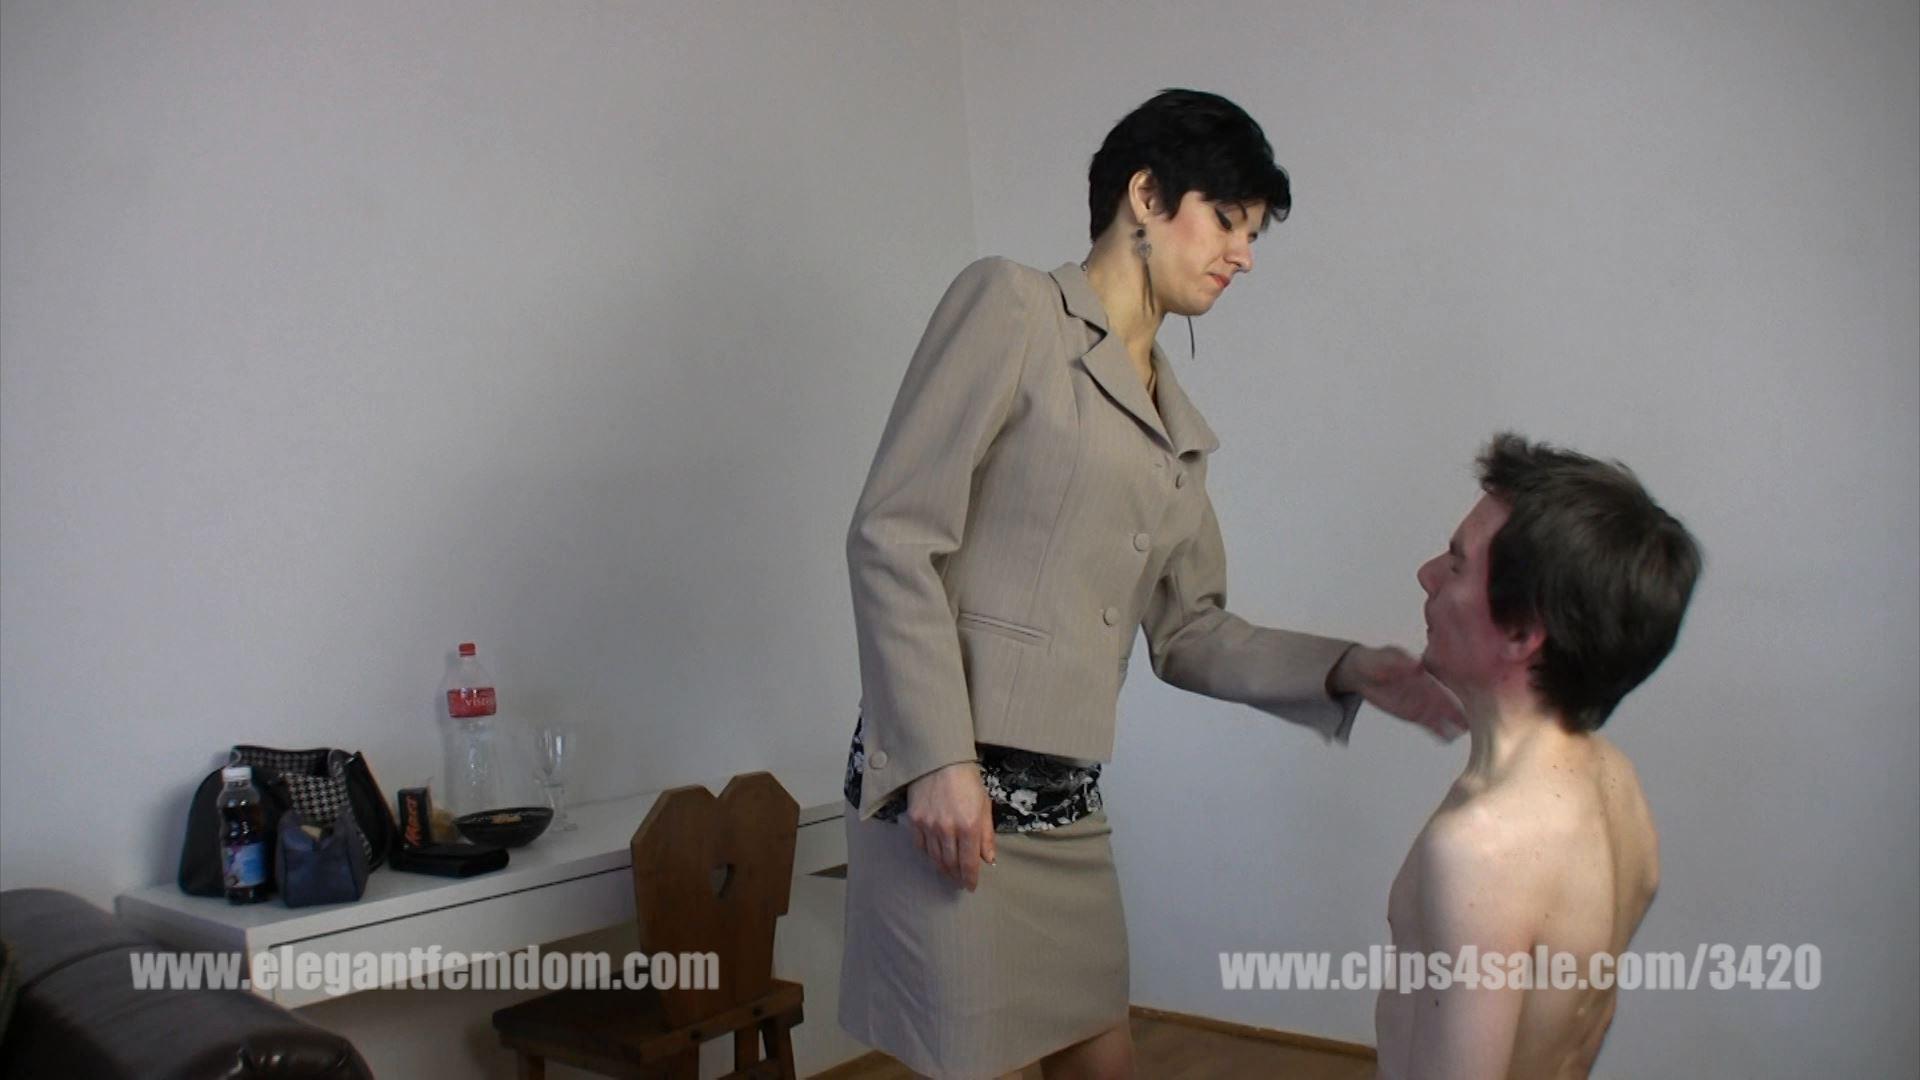 Short faceslapping clip with mistress - ELEGANTFEMDOM - FULL HD/1080p/MP4